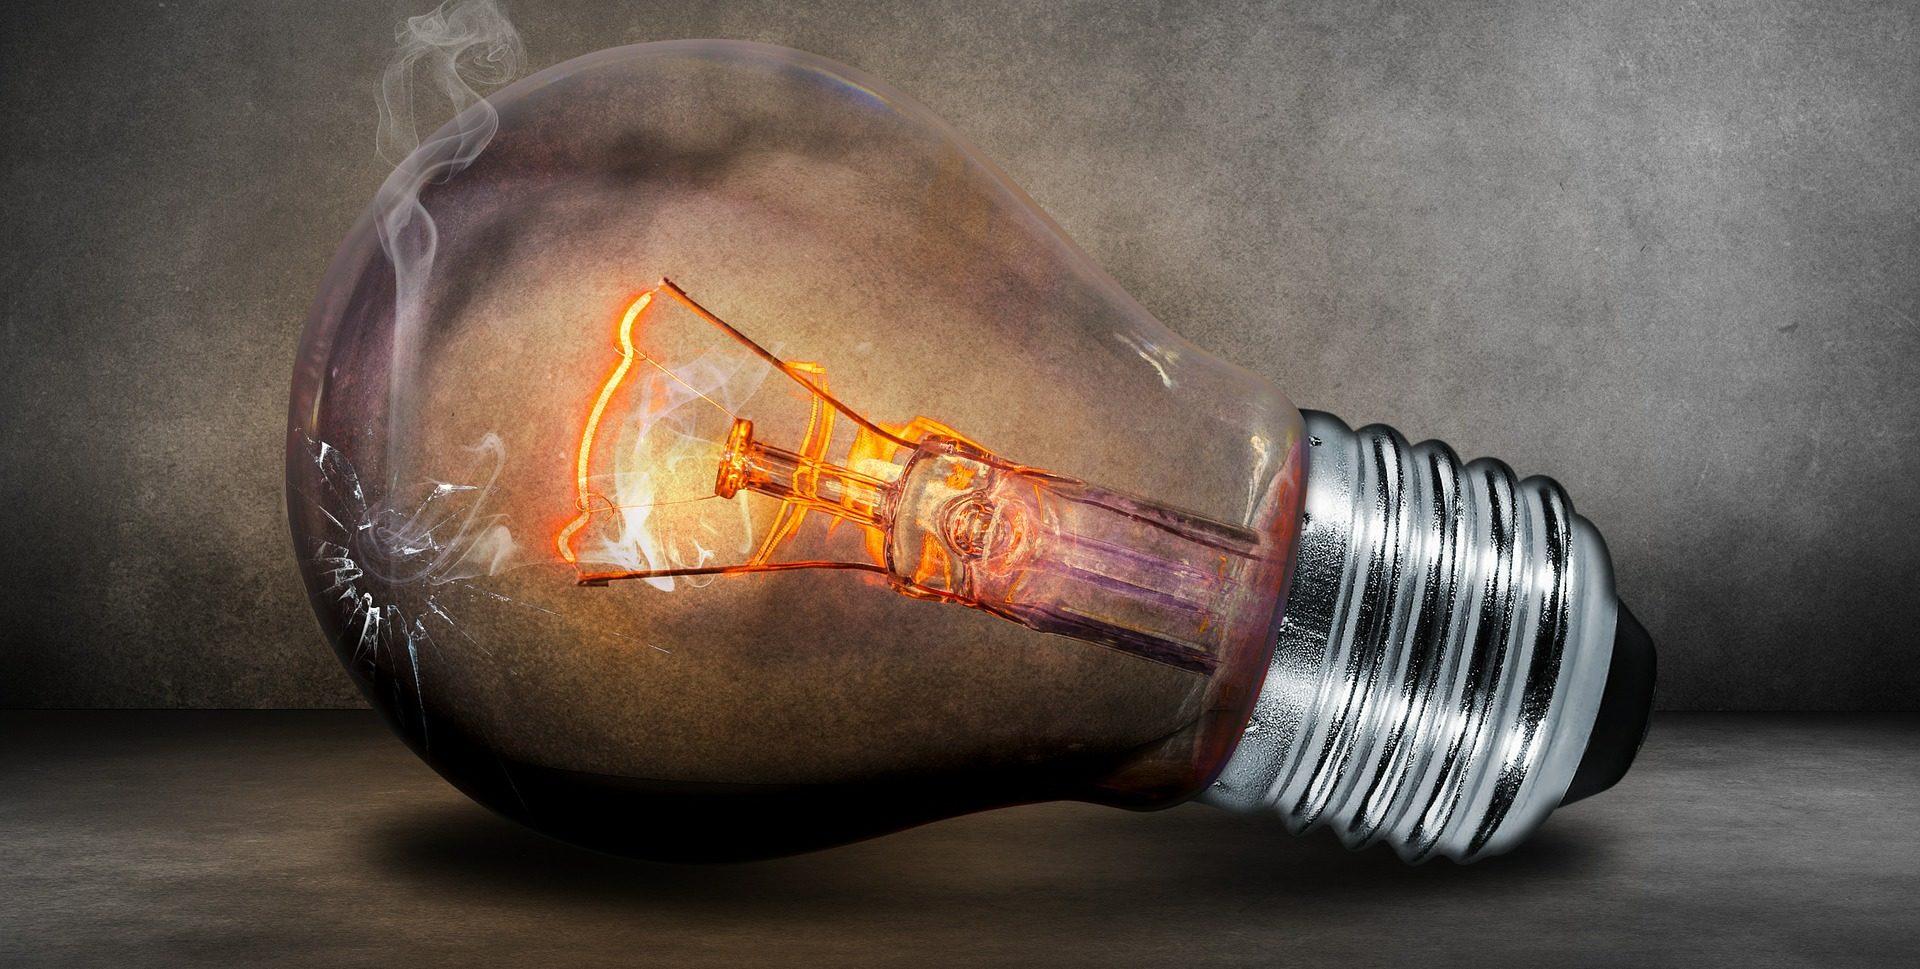 light-bulb-503881_1920-e1474233382516